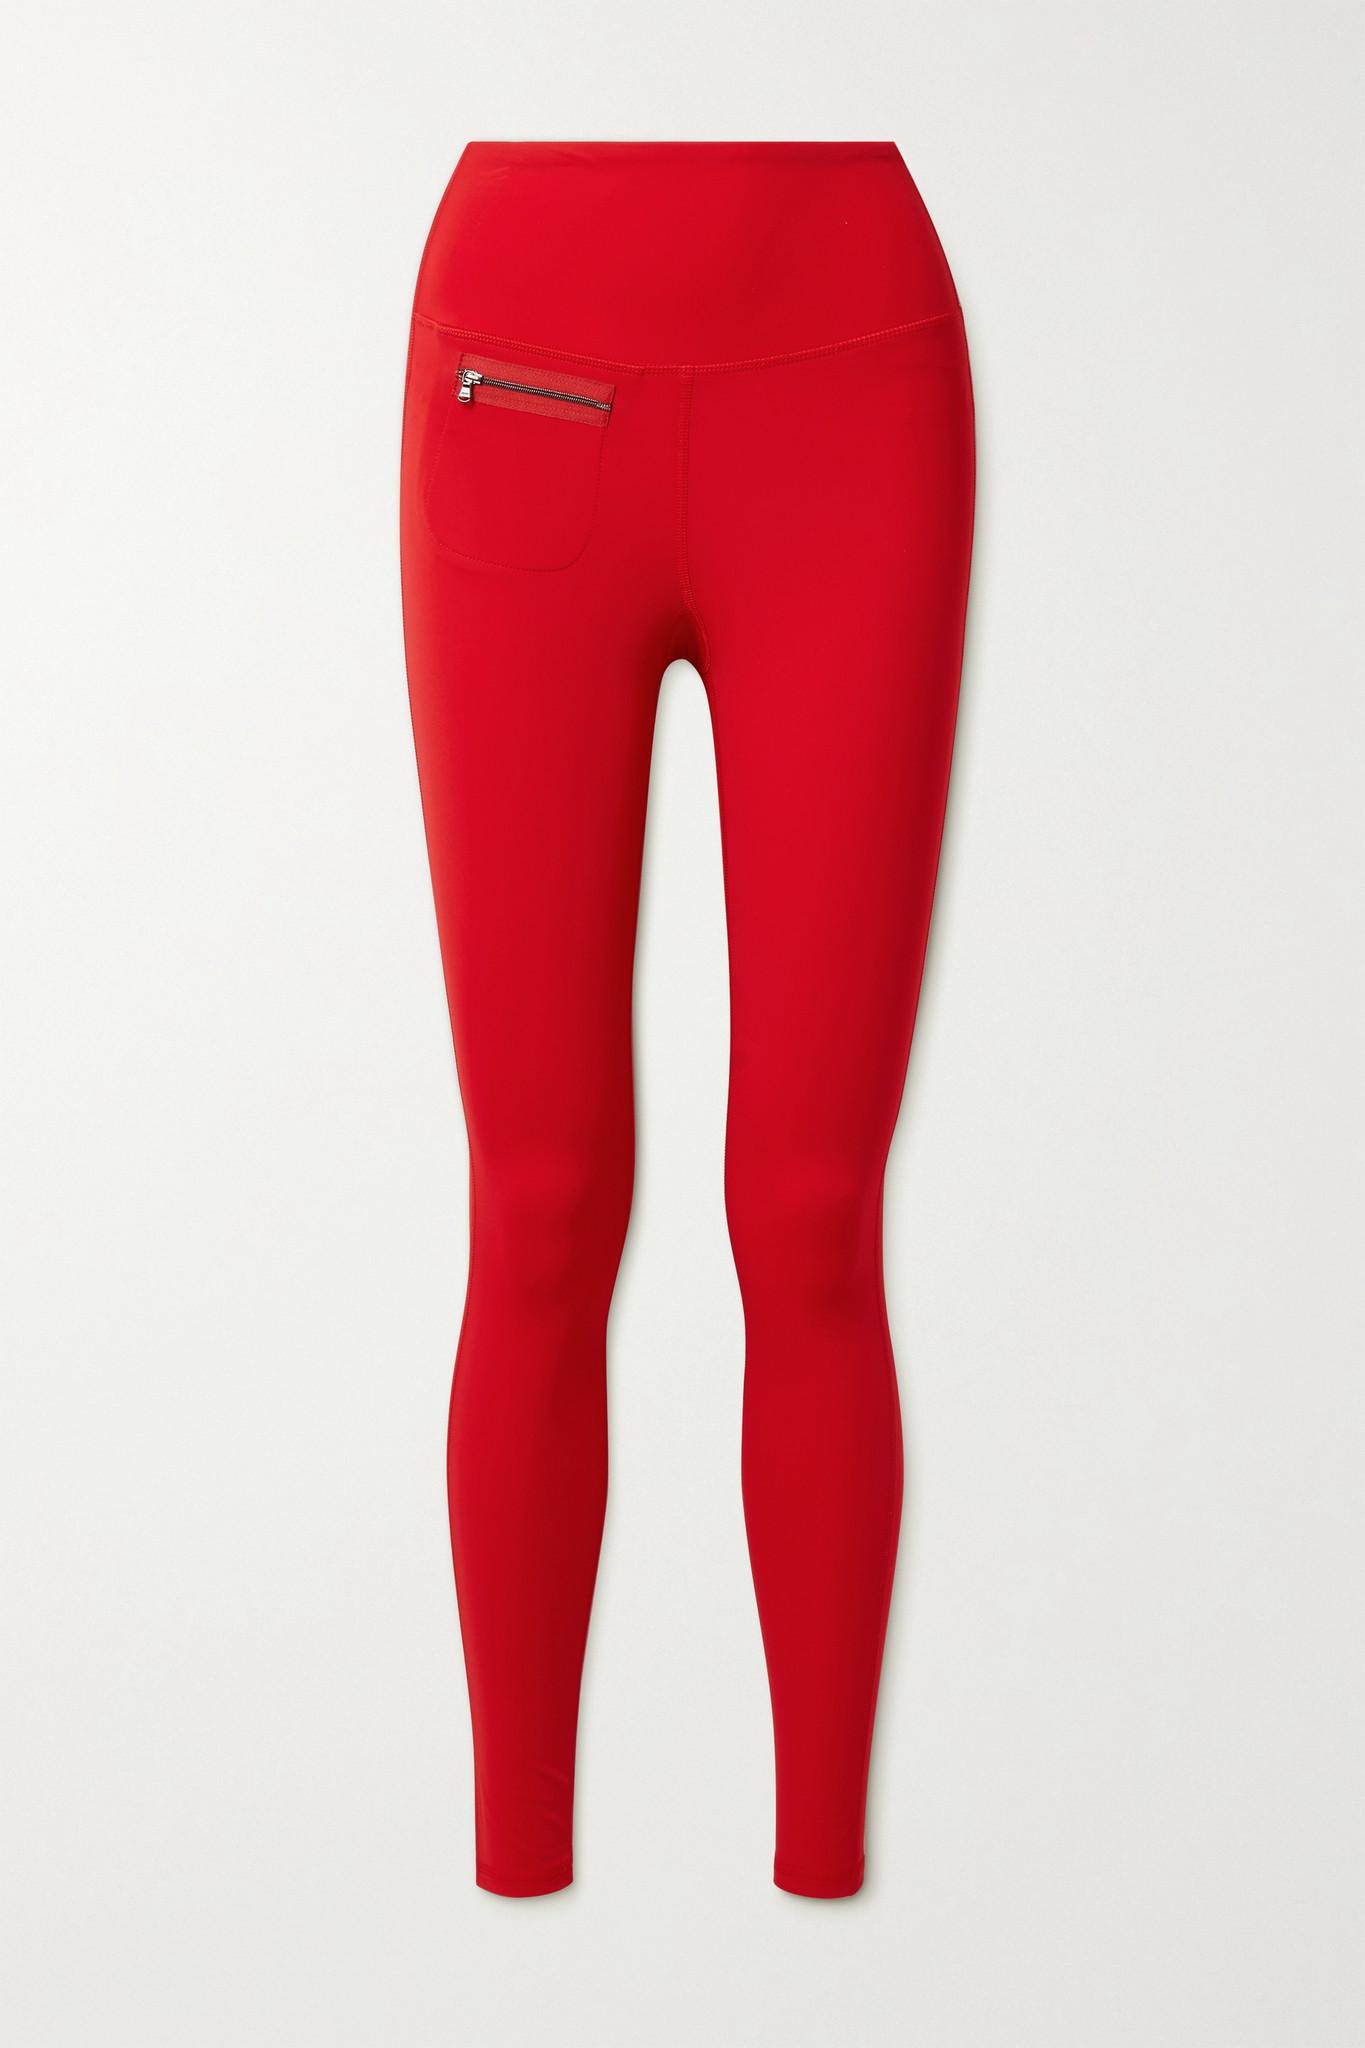 ERIN SNOW - Peri Stretch Ski Leggings - Red - small